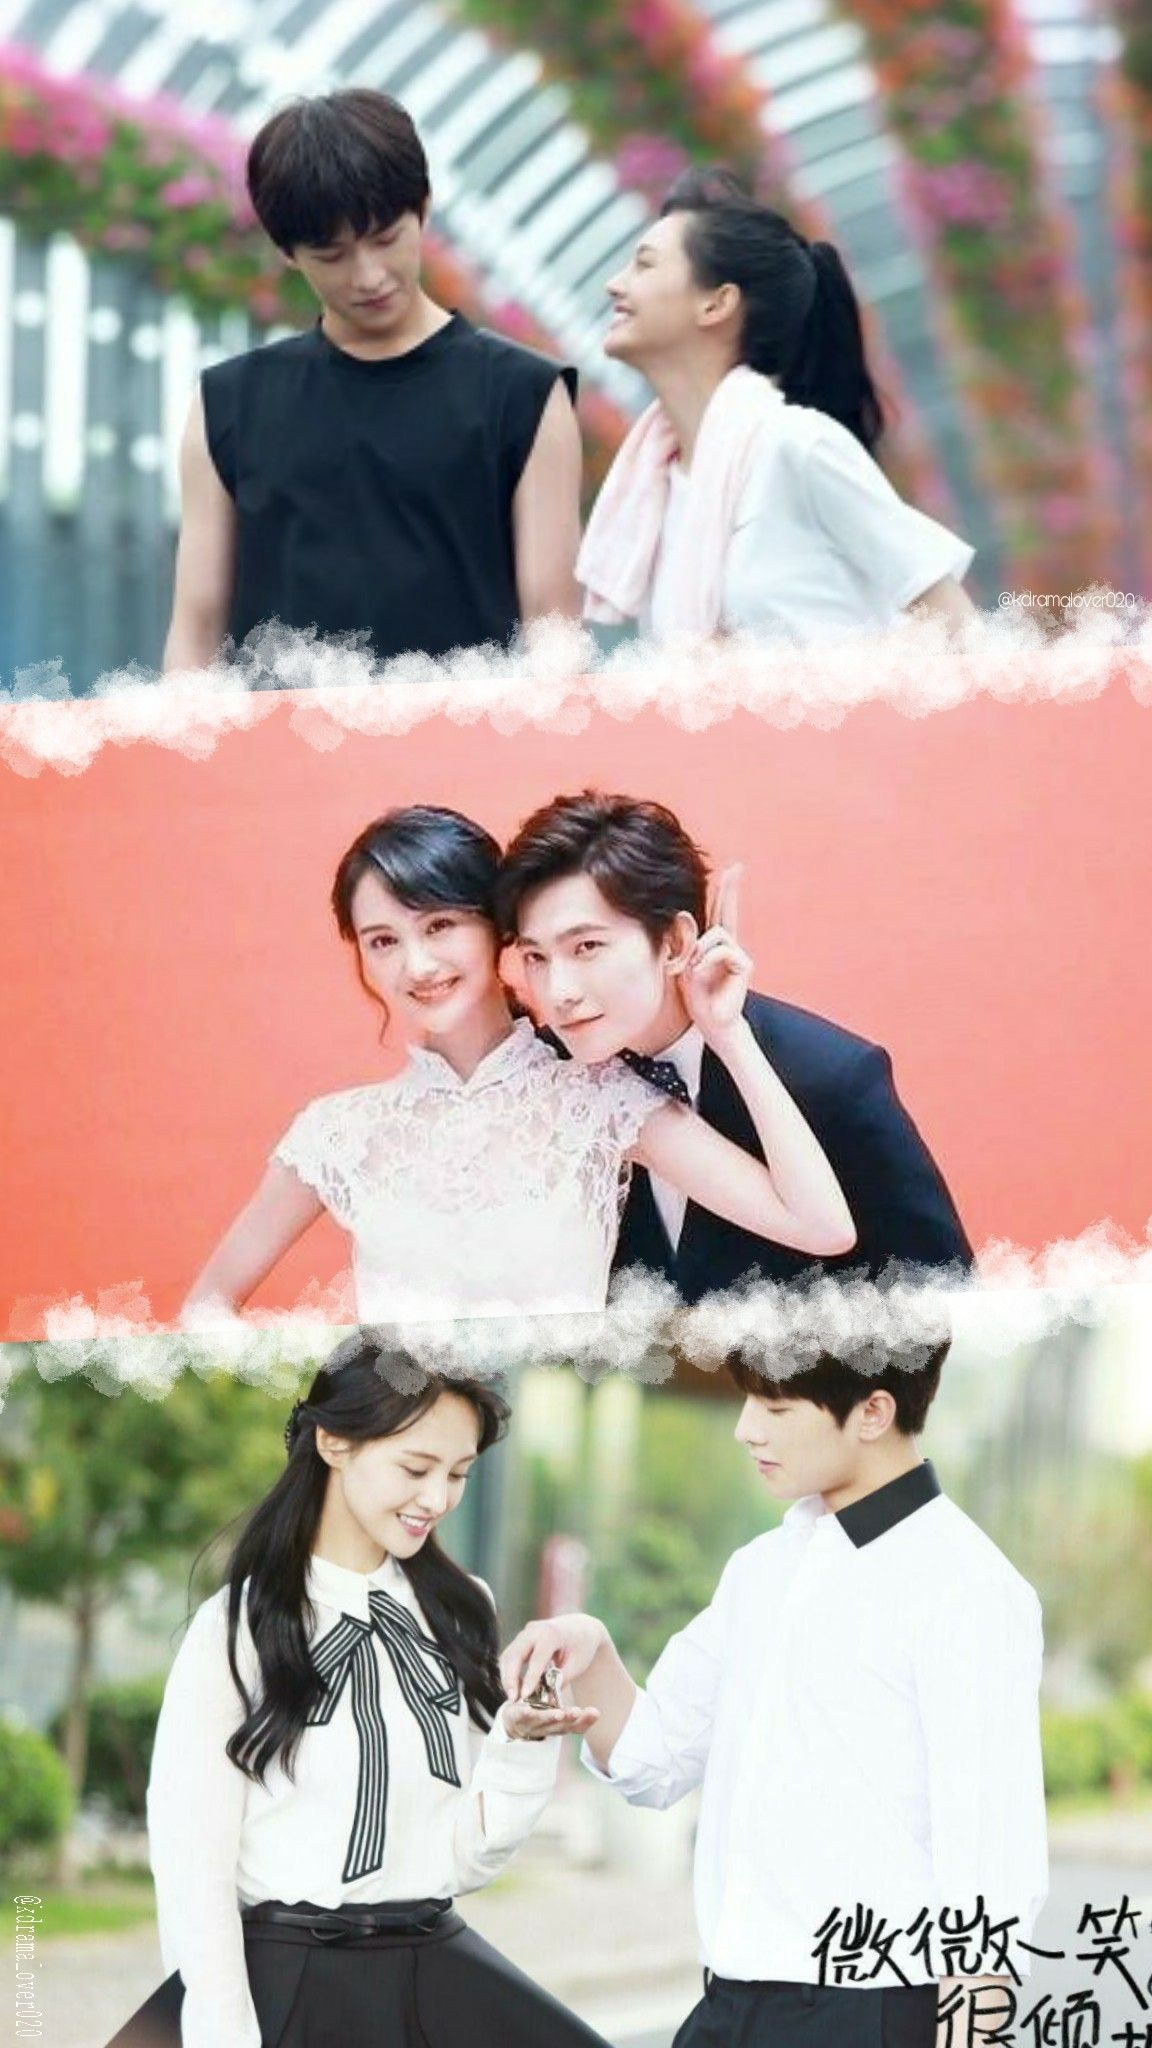 Love020 Loveo2o Yangyang Zhengshuang Wallpaper Edited By Kdramalover020 Me Yang Yang Actor Cute Couples Cute Love Stories